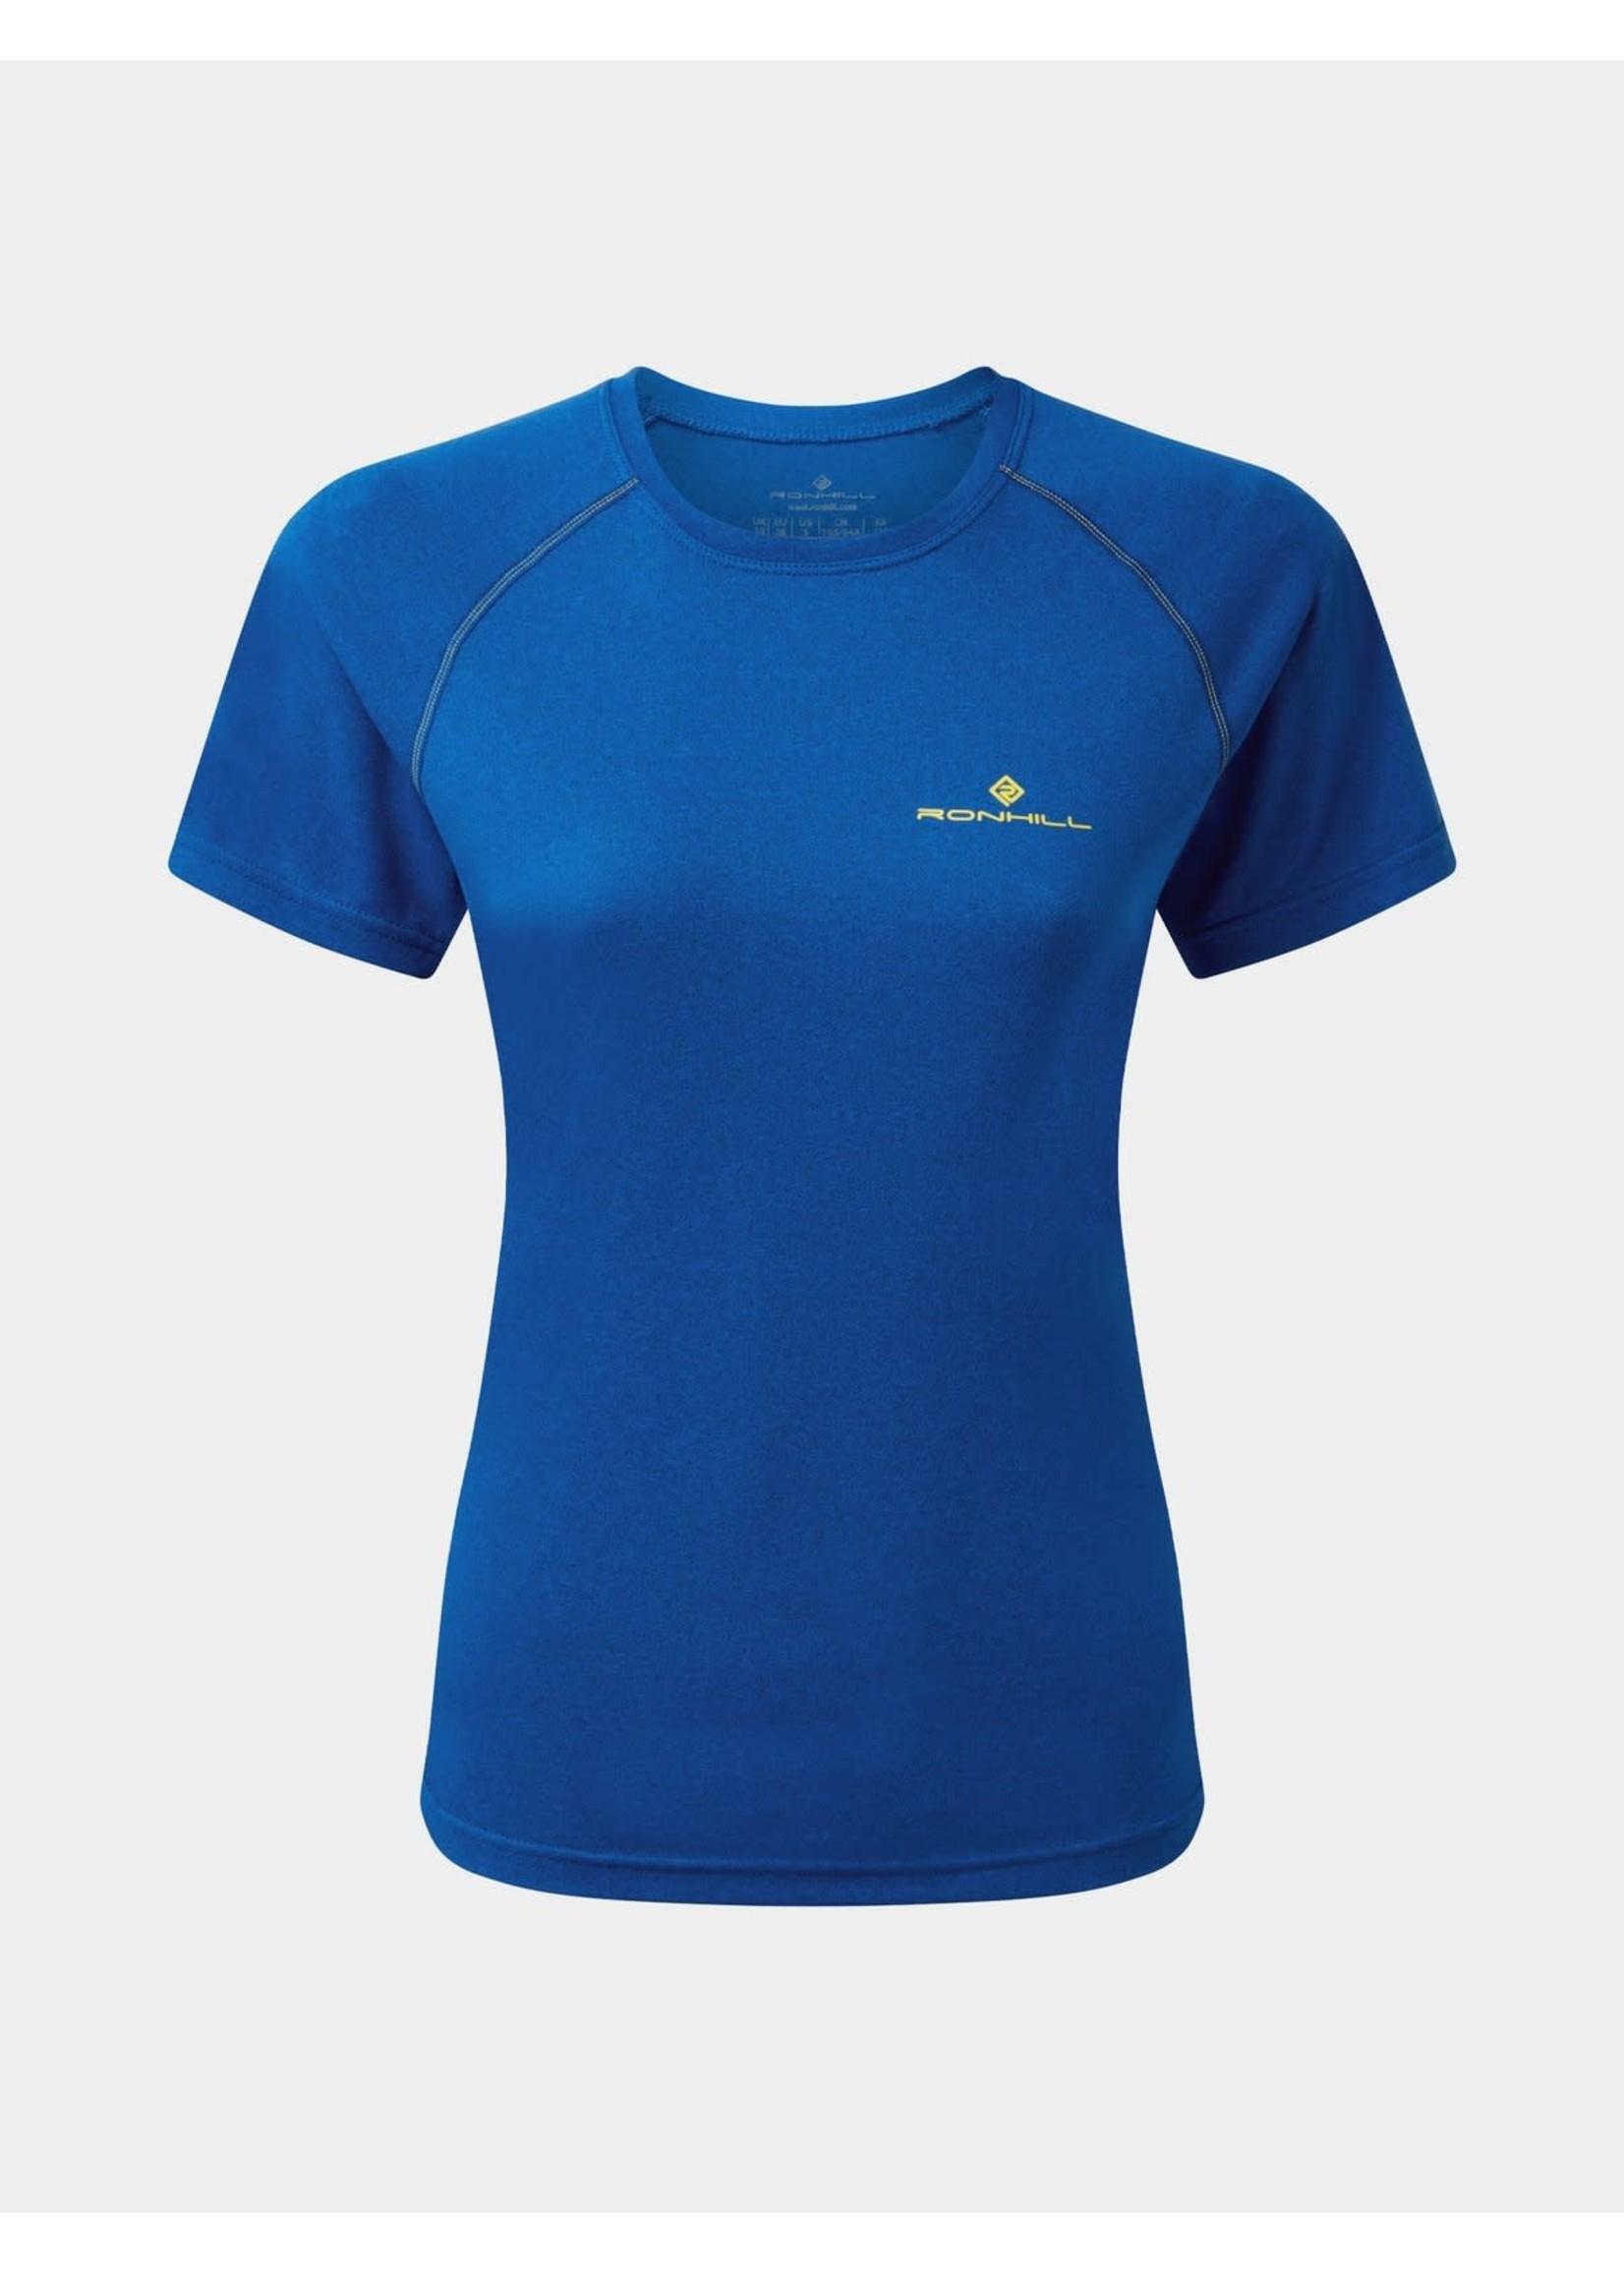 Ronhill Ron Hill Core Ladies T Shirt (2021) - Azurite Marl